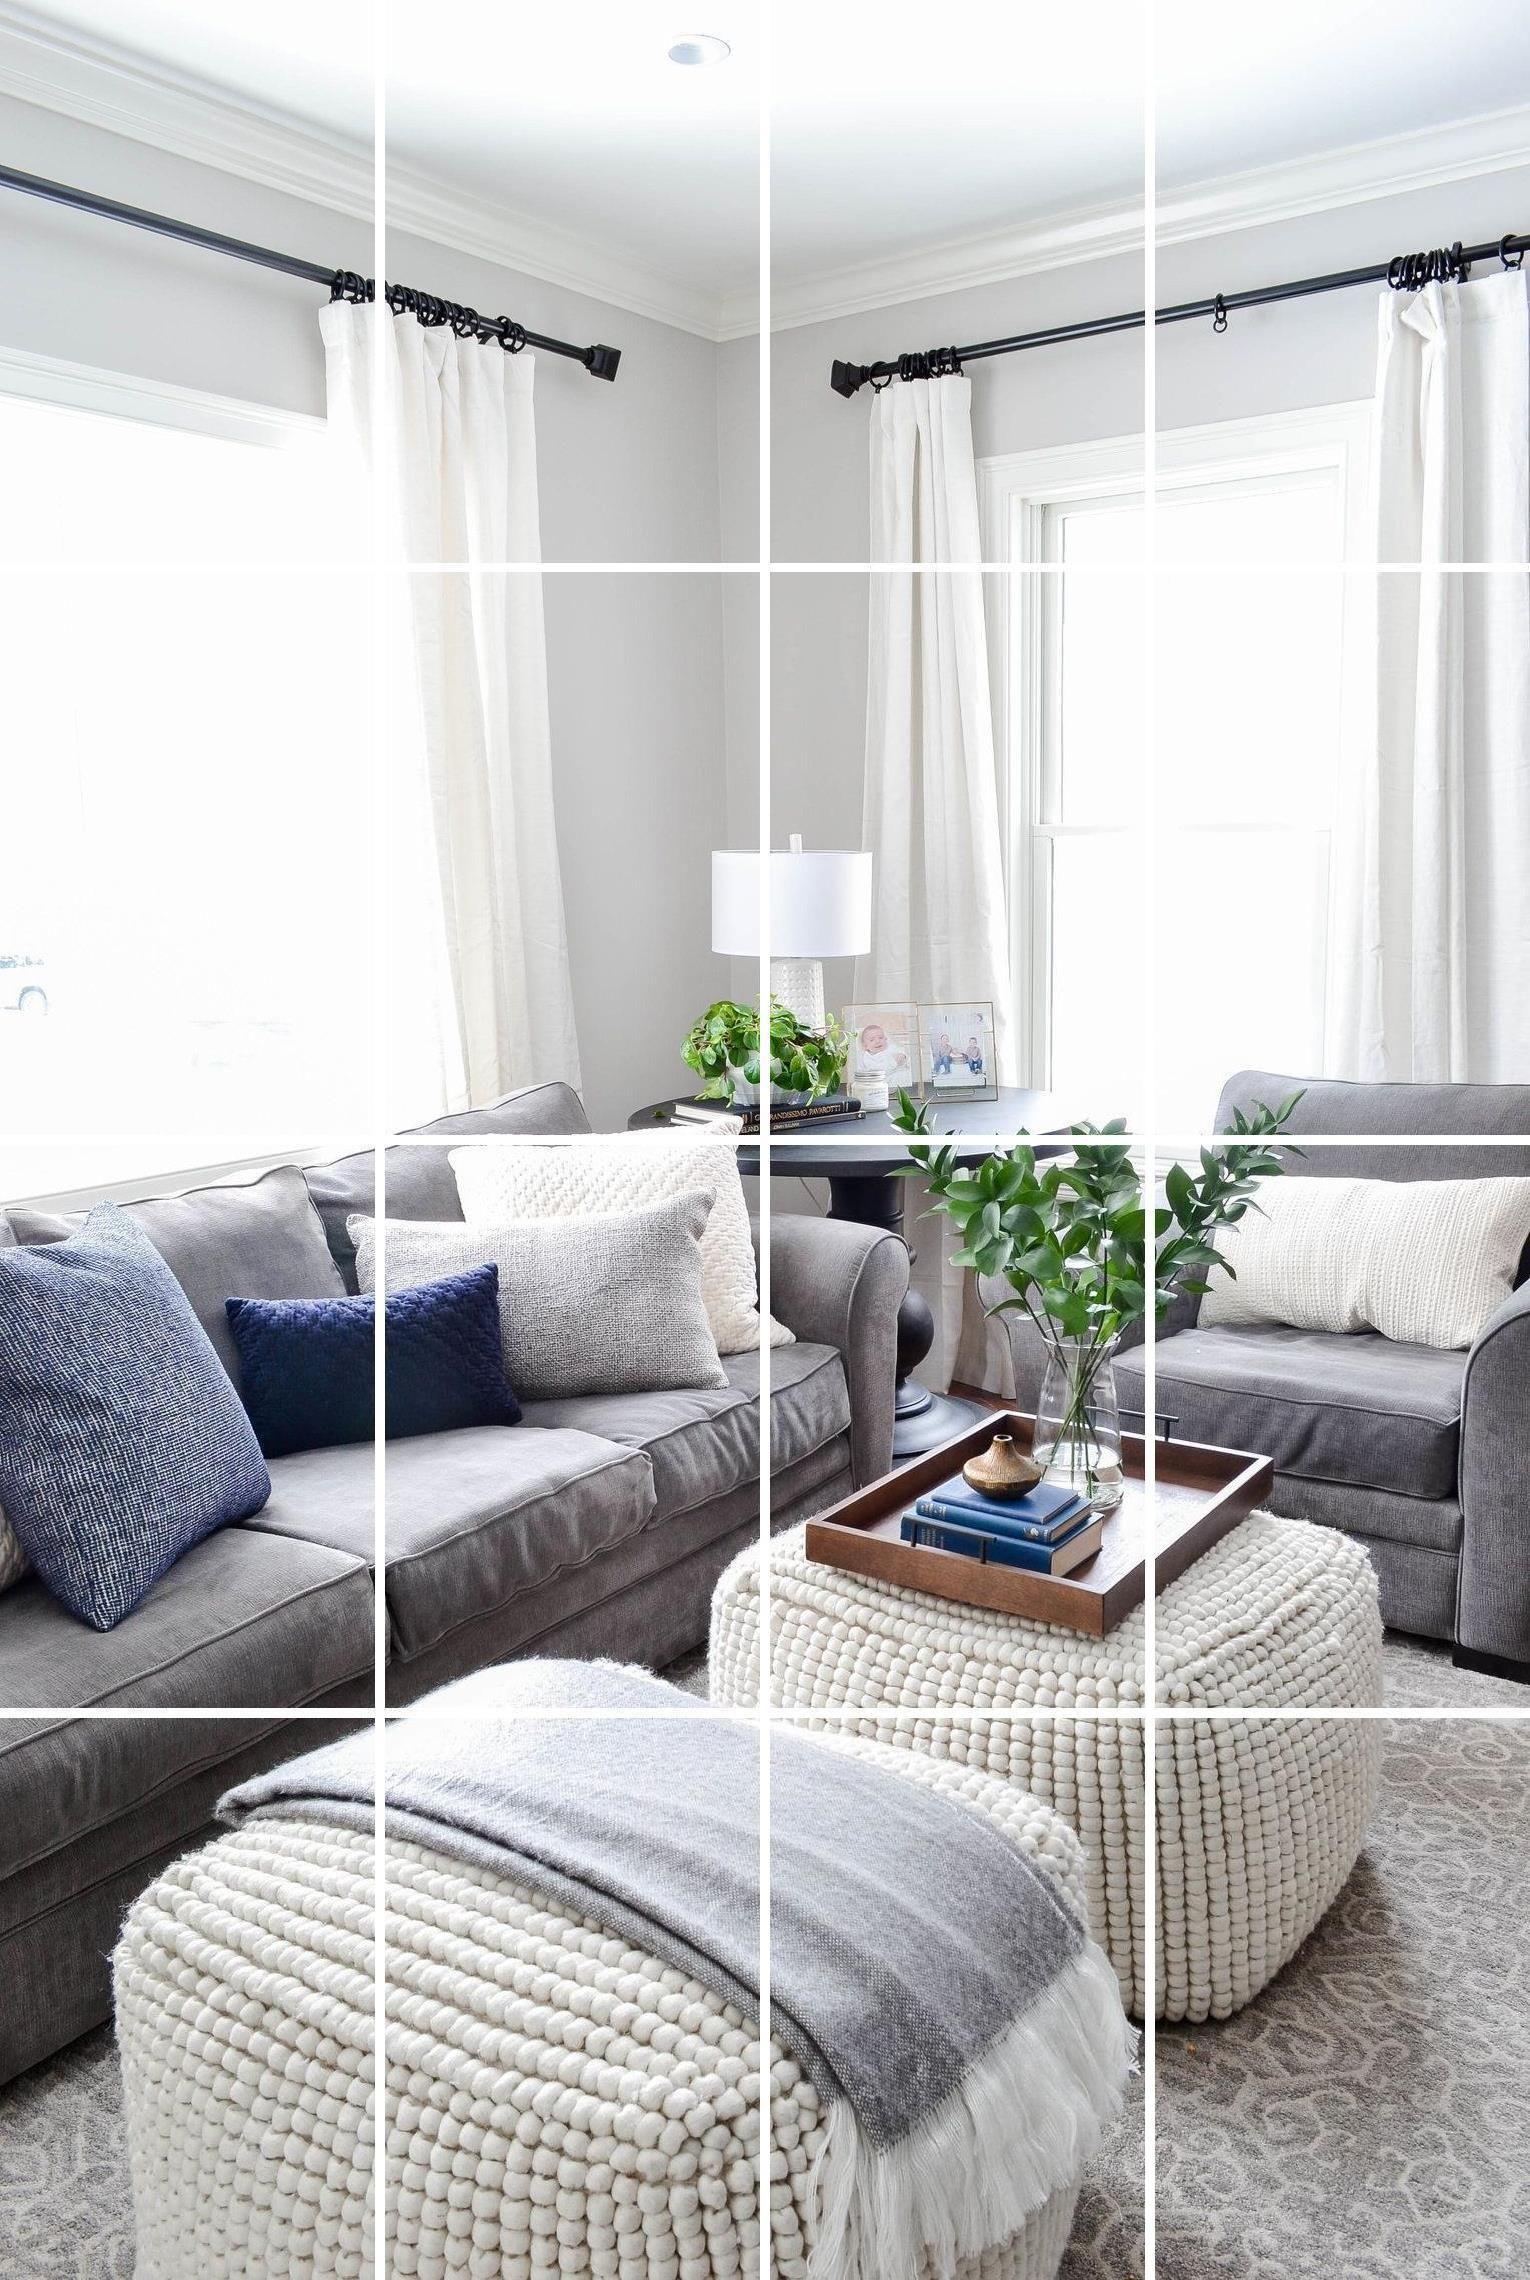 Interior Design Ideas For Sitting Rooms: Sitting Room Furniture Ideas